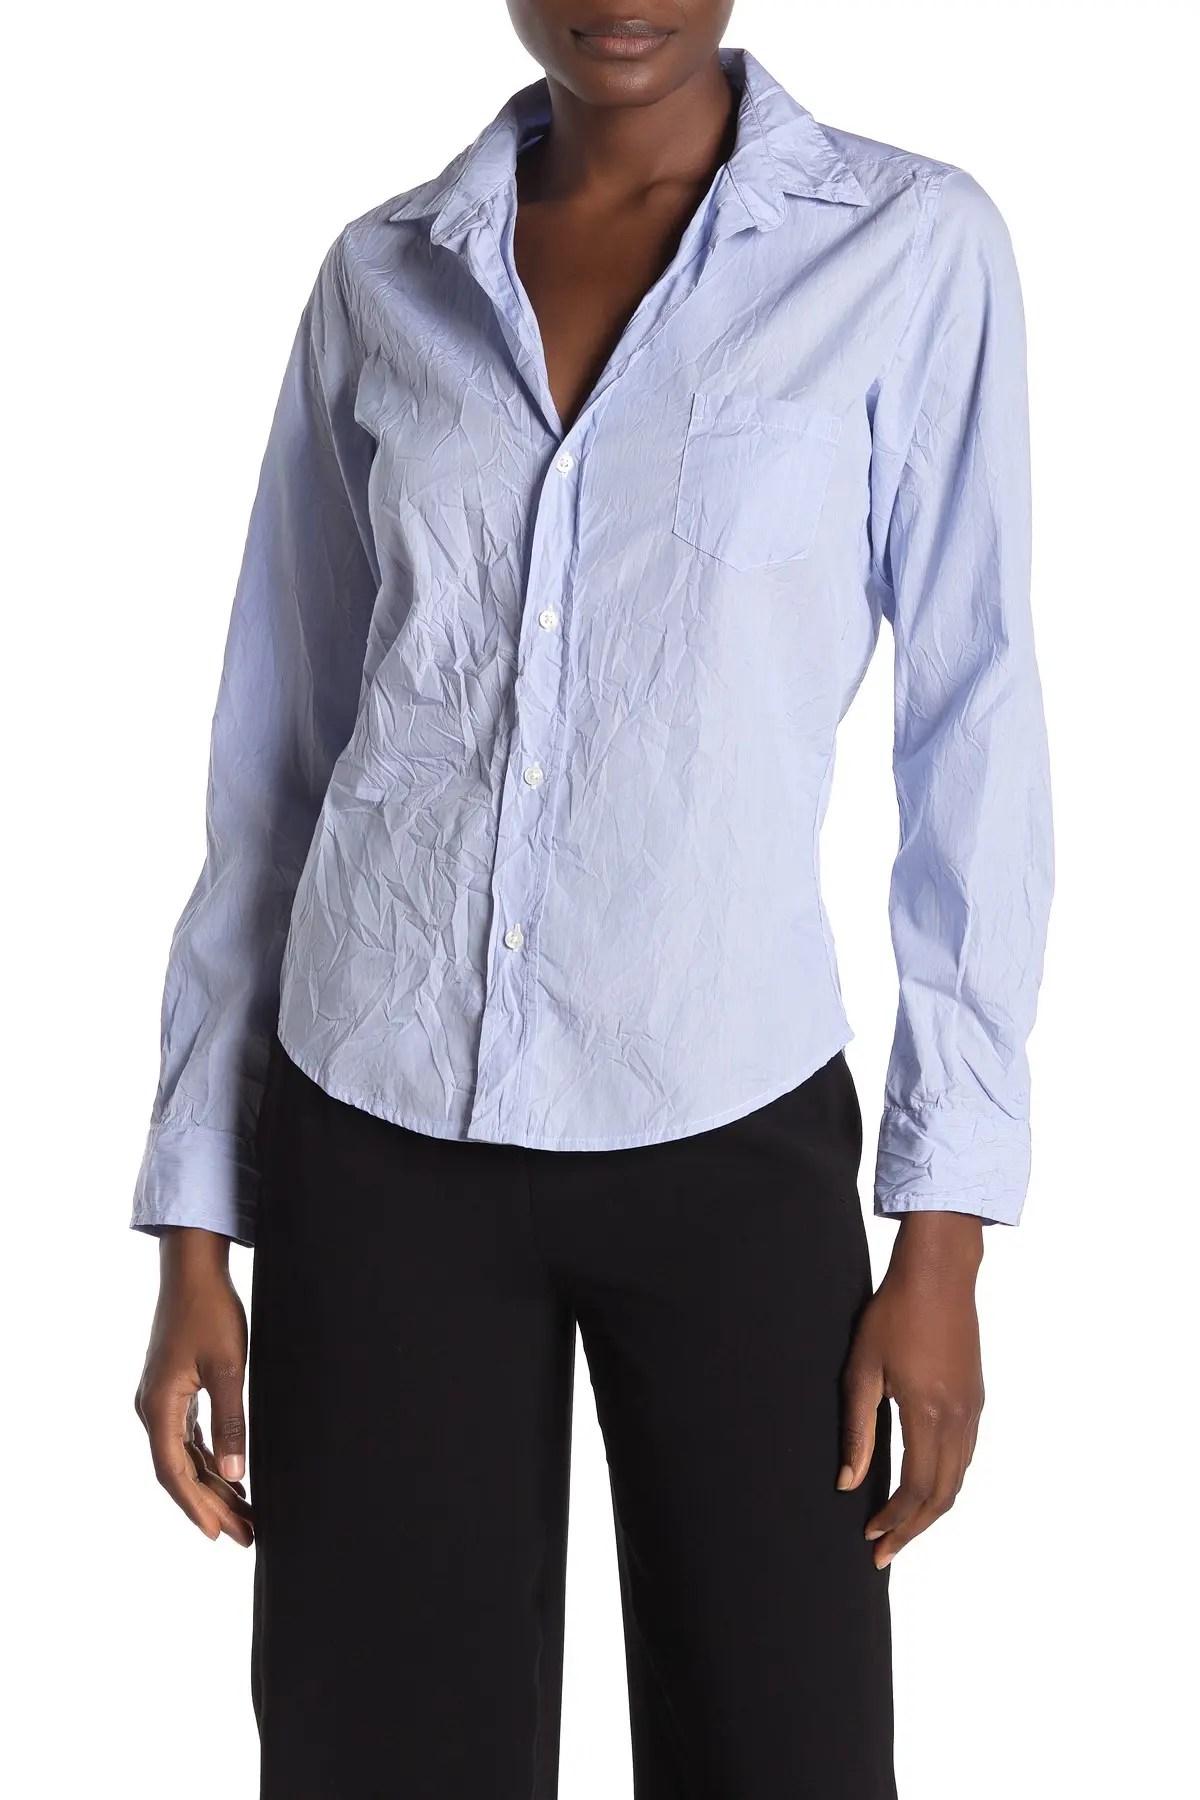 frank eileen barry signature crinkle stripe print shirt nordstrom rack